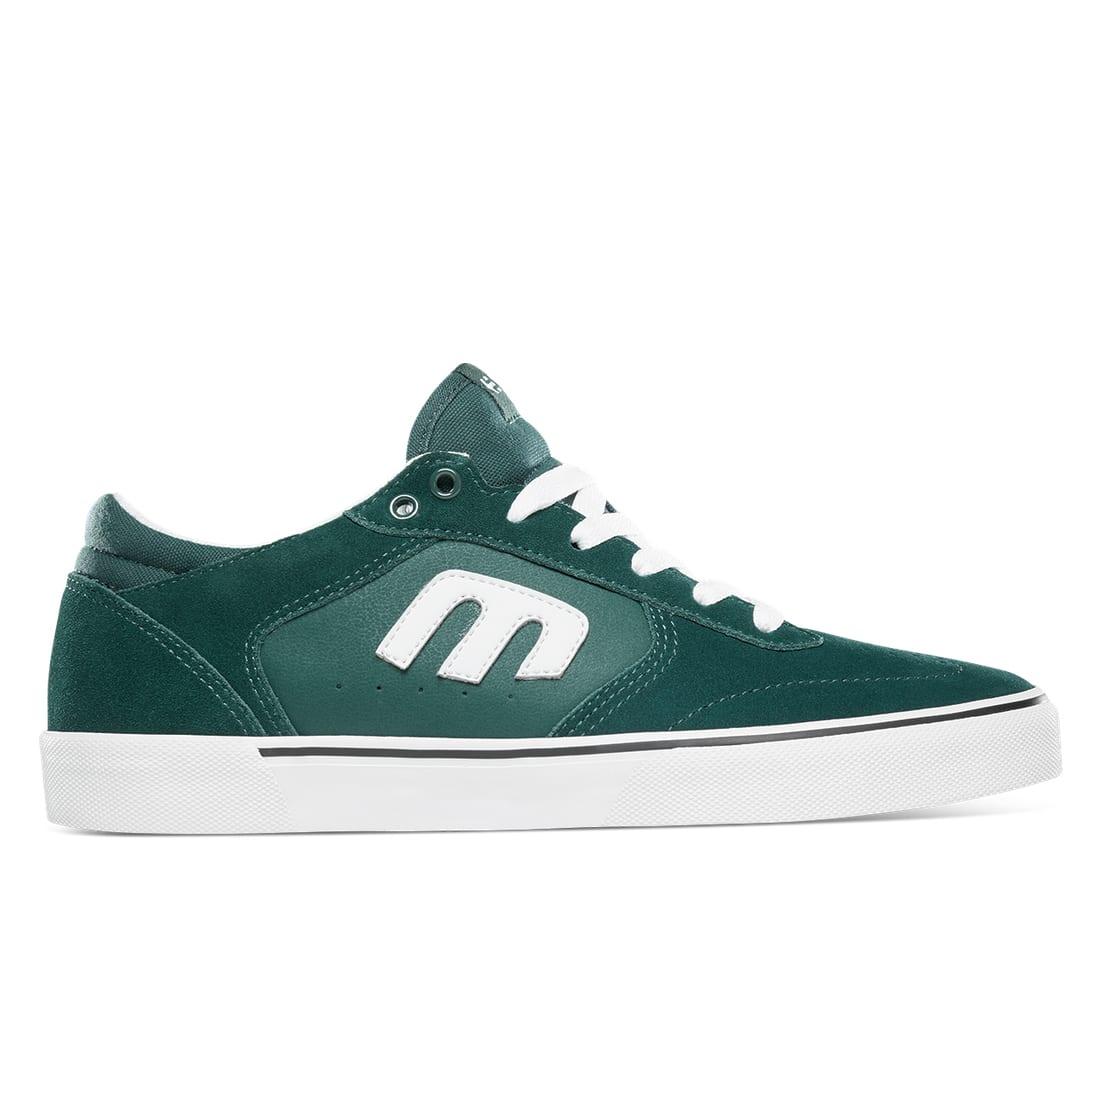 Chaussures Etnies Windrow Vulc Green White Gum